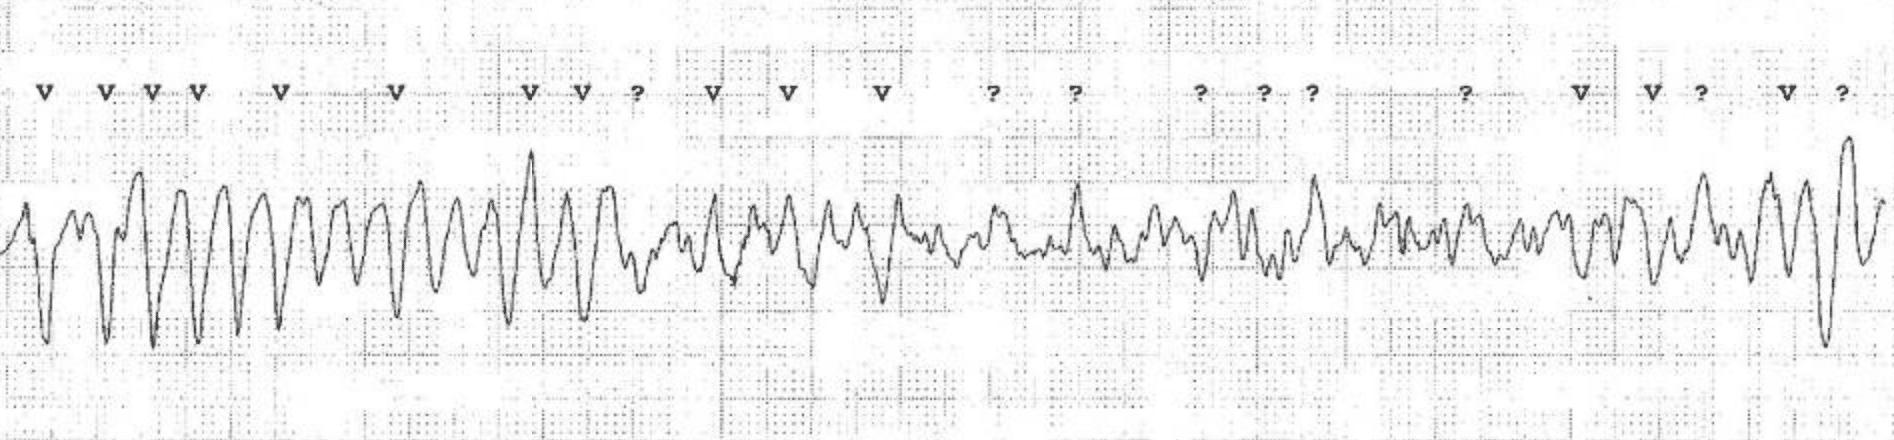 Torsade de Pointes ventricular tachycardia degenerating into ventricular fibrillation.